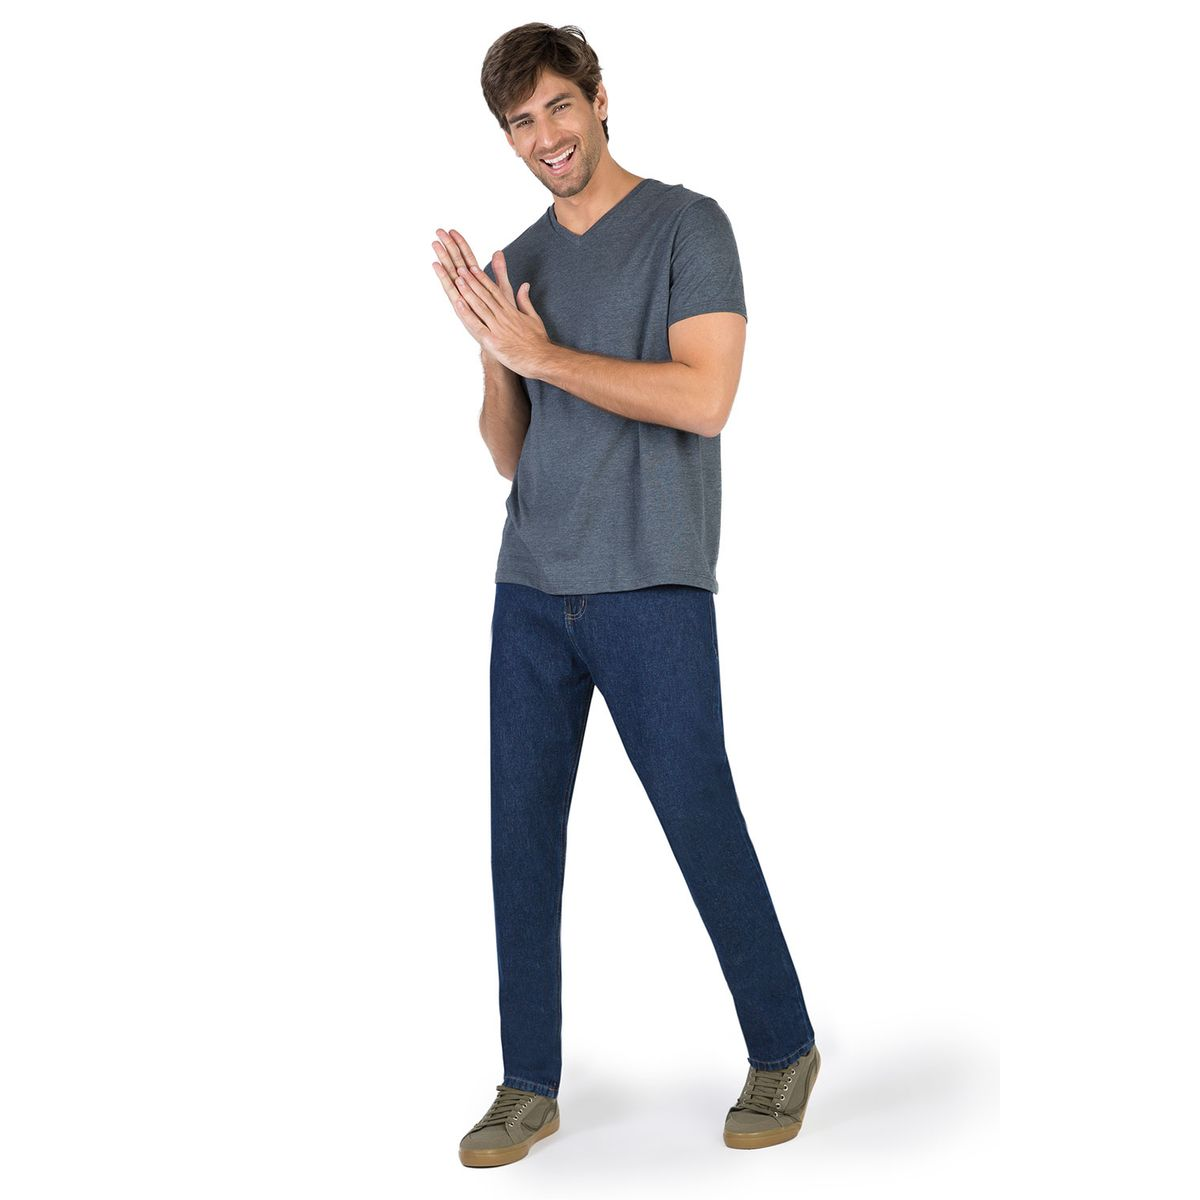 f513f0f41 Calça Jeans Comfort Basic Stone New - Taco